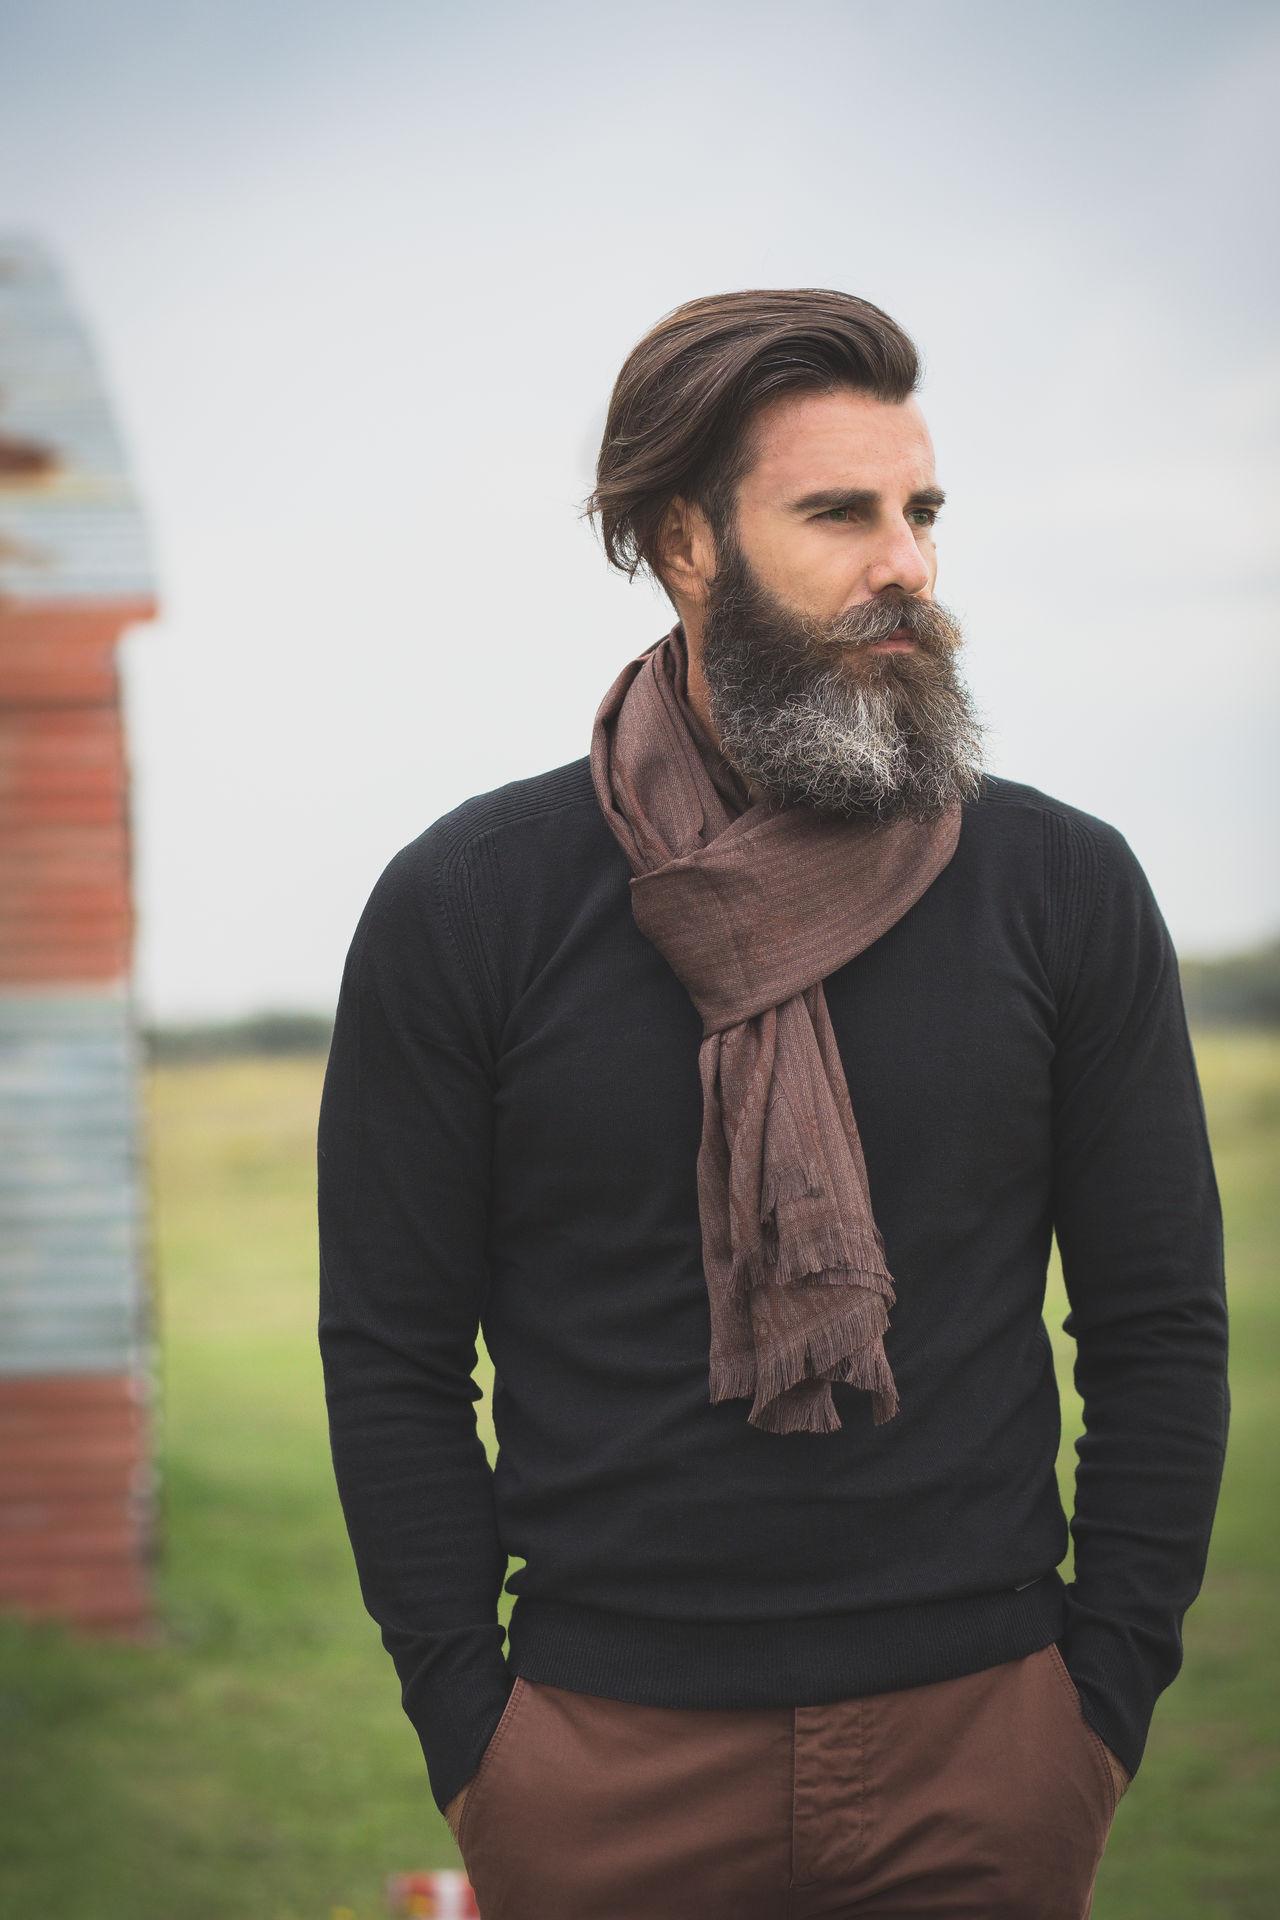 Beautiful stock photos of liebe, 45-49 Years, Beard, Casual Clothing, Caucasian Ethnicity